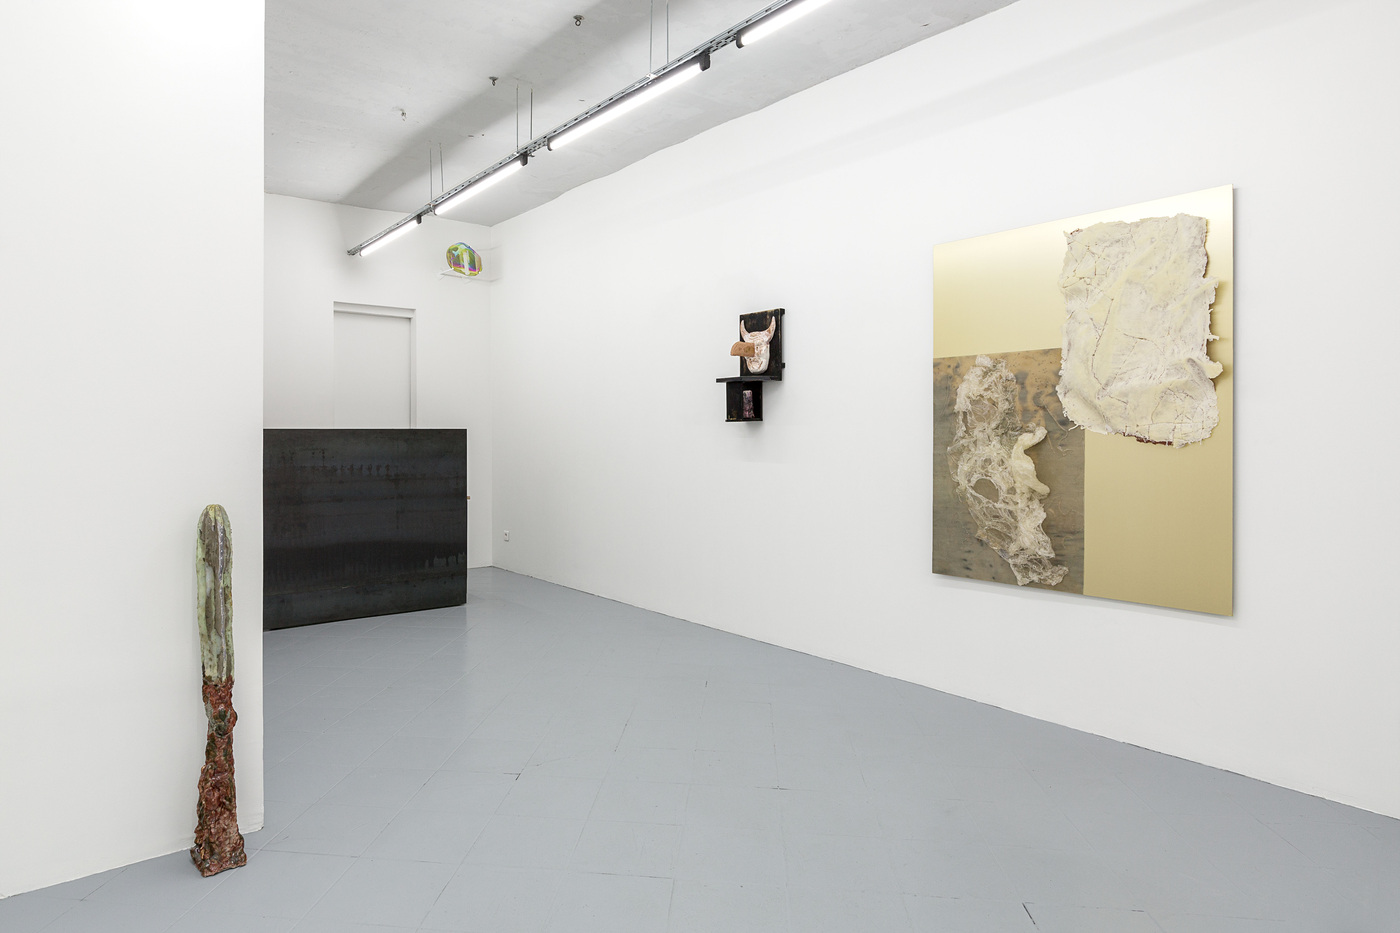 Rebranding Floes - Galerie Pauchant-6780